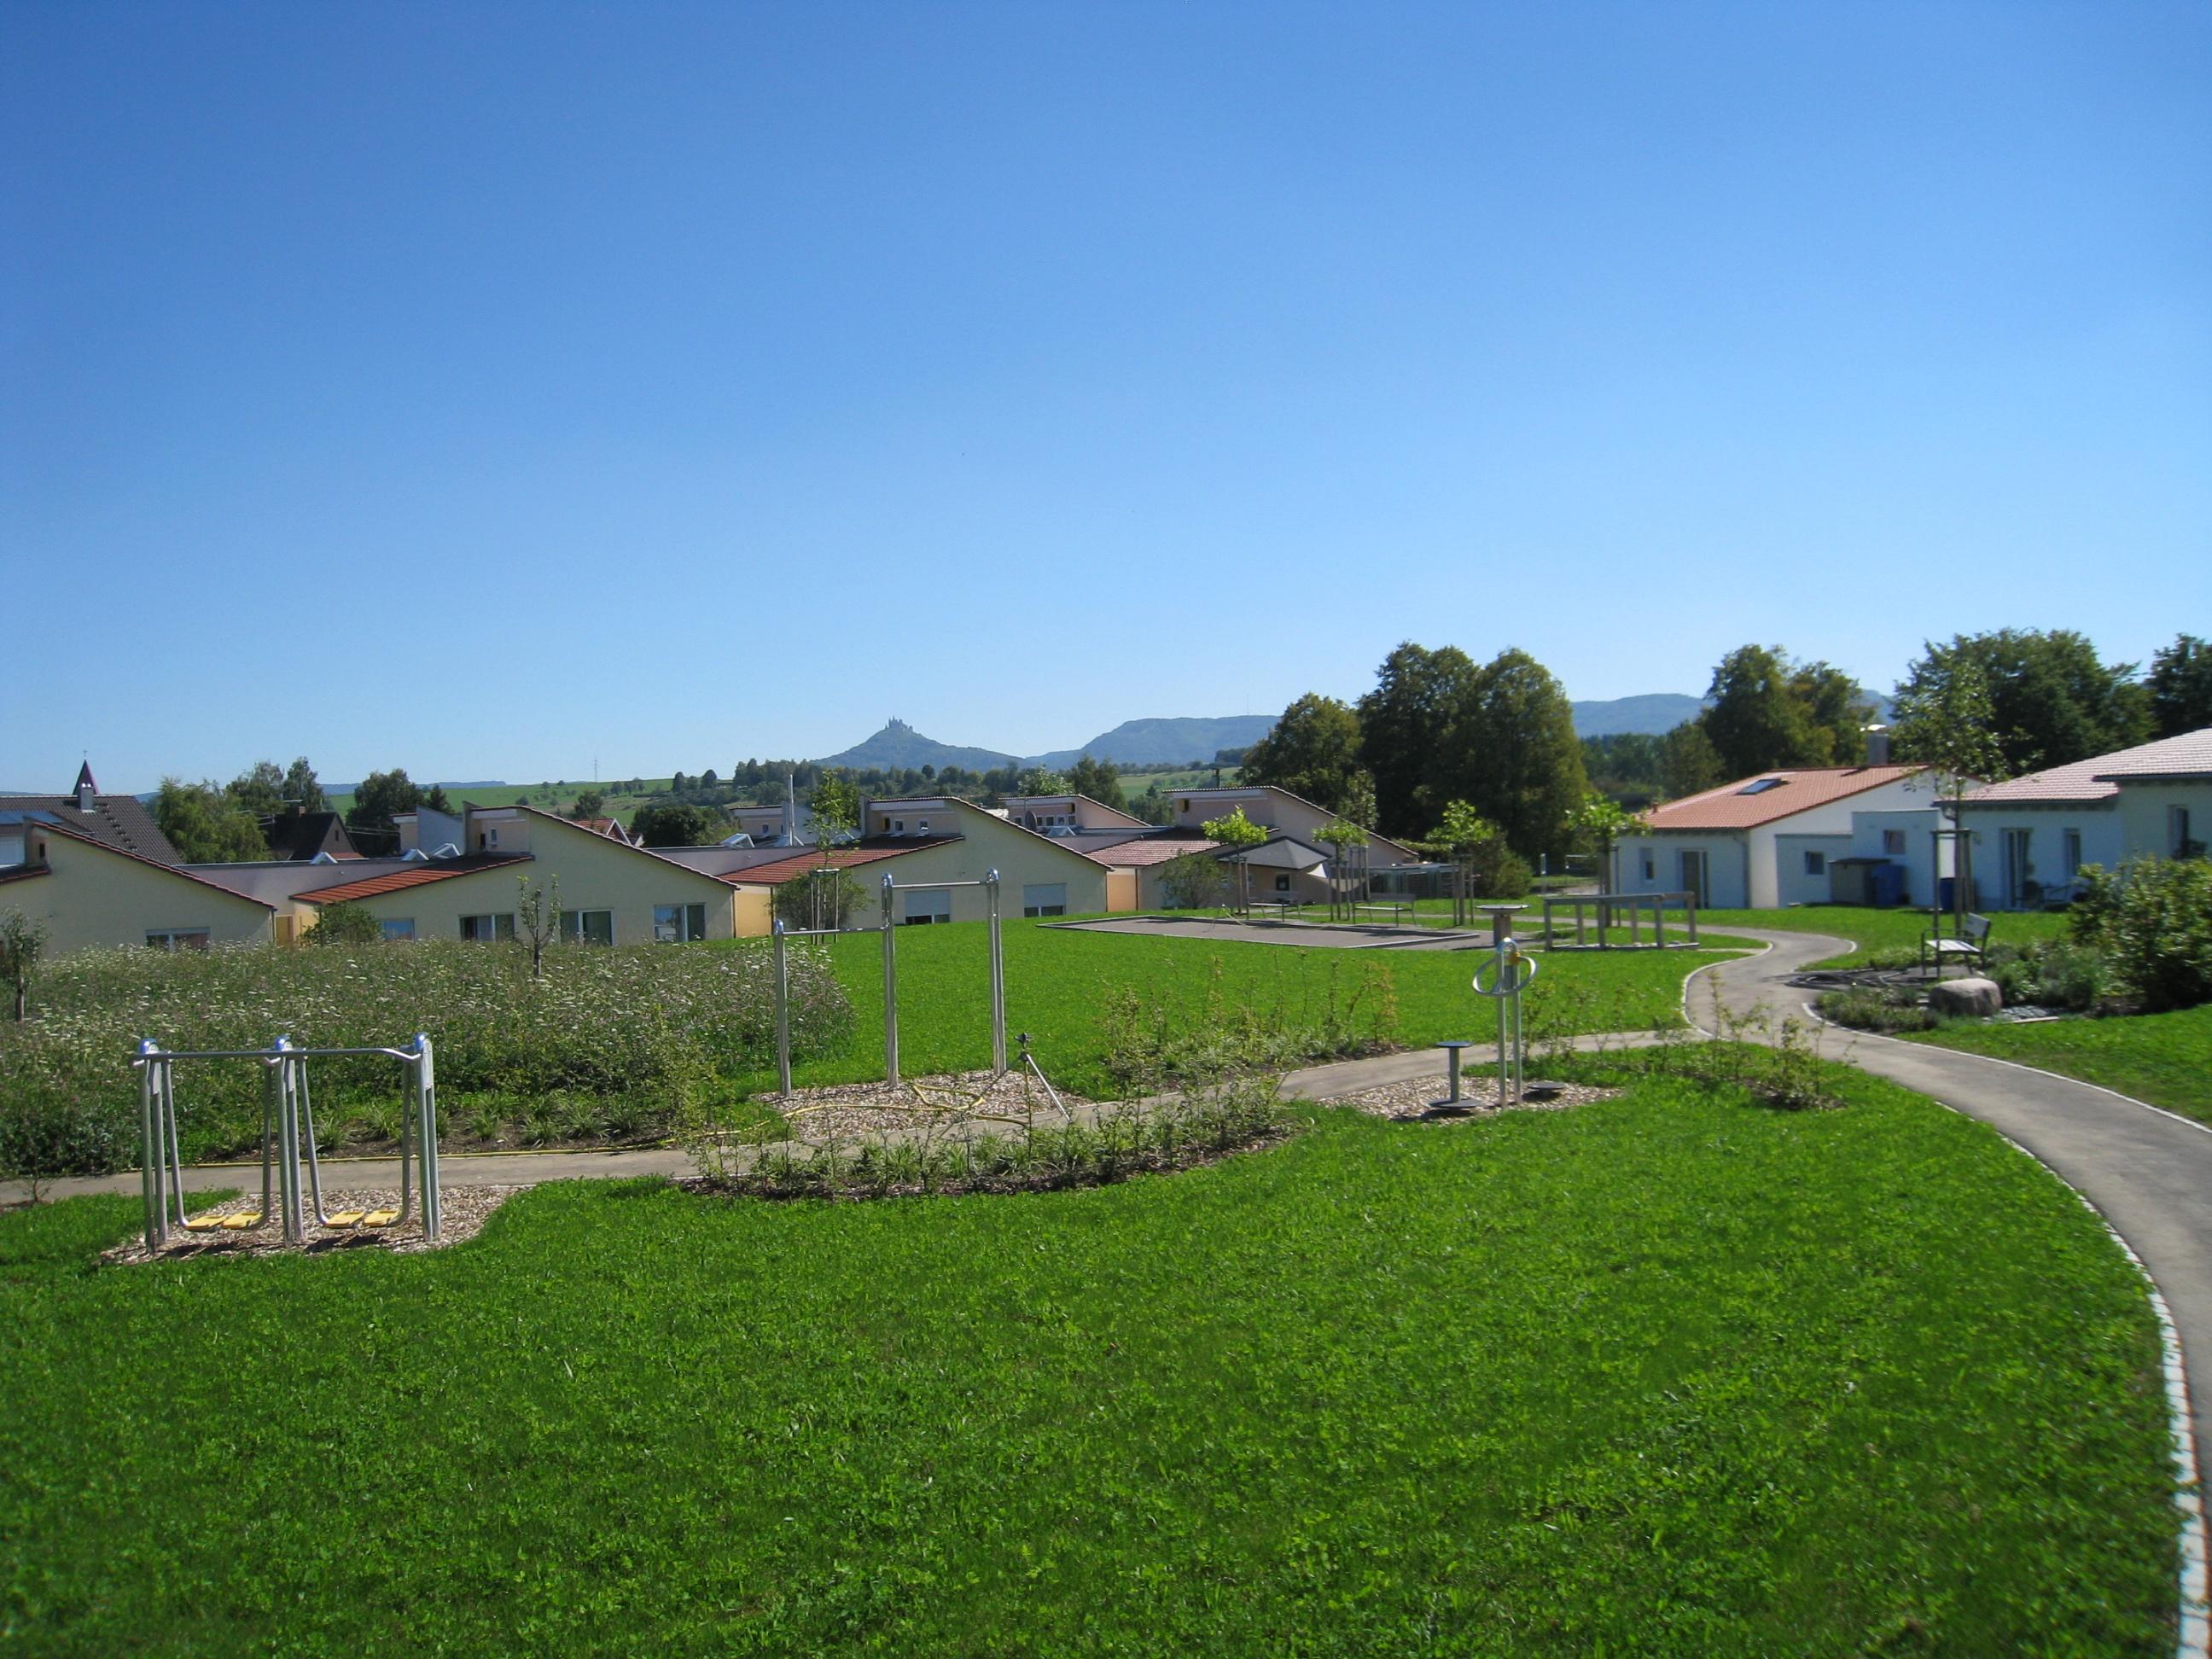 Mehrgenerationenpark